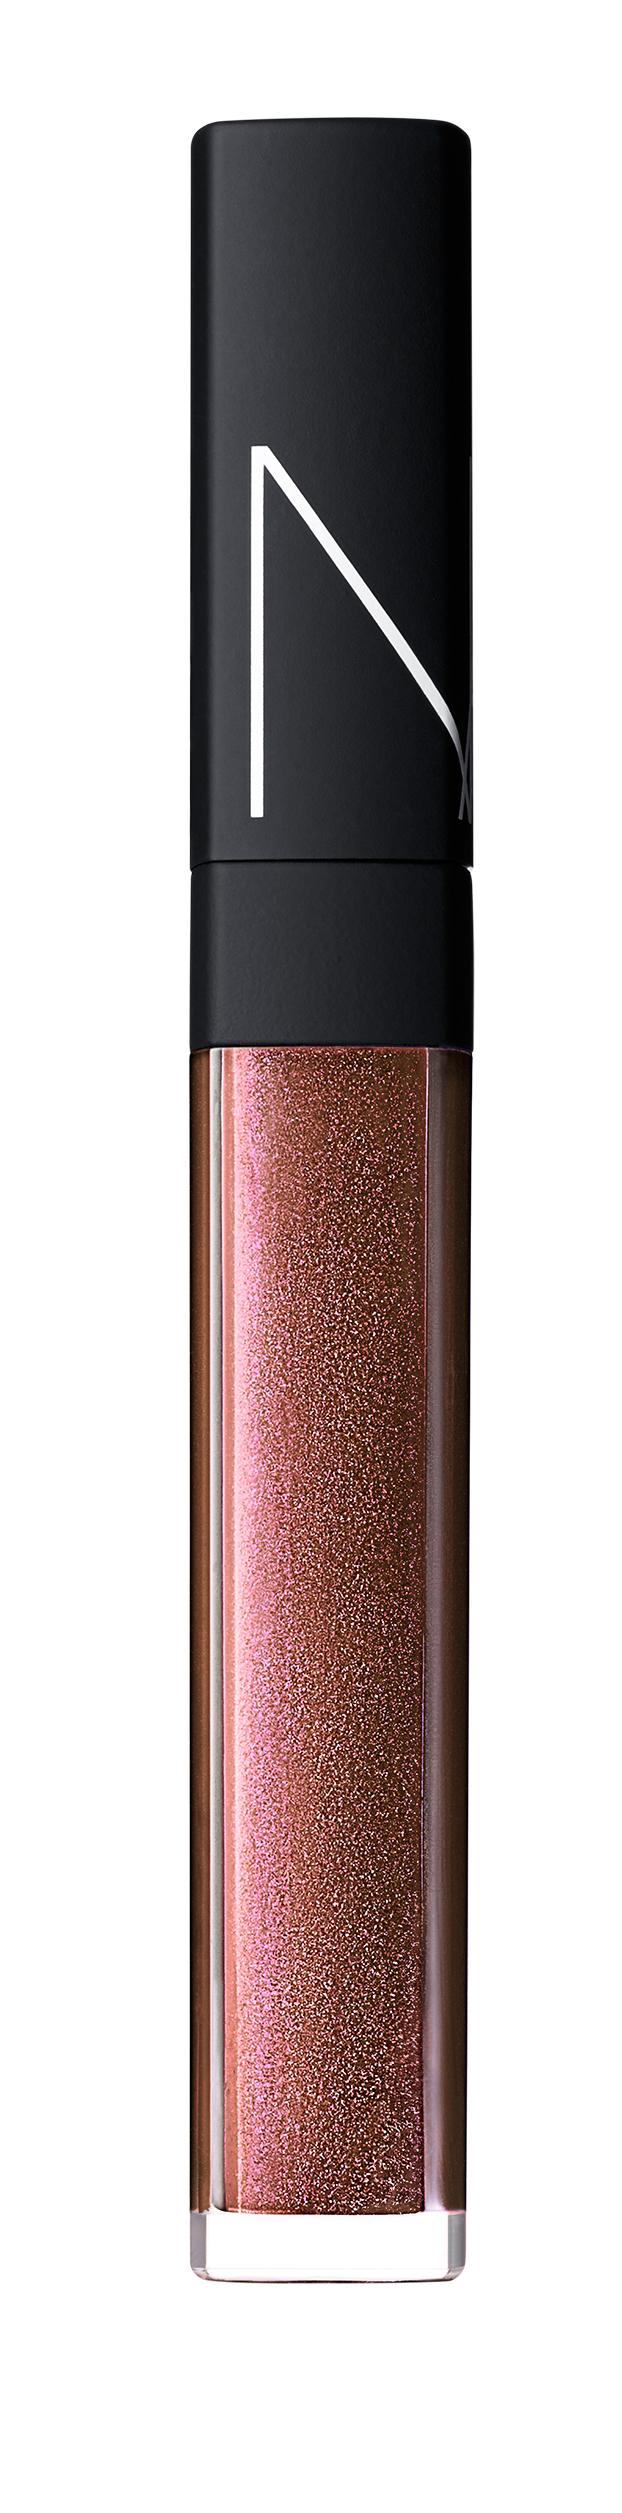 NARS Spring 2017 Color Collection Asphalt Jungle Lip Gloss - jpeg.jpg